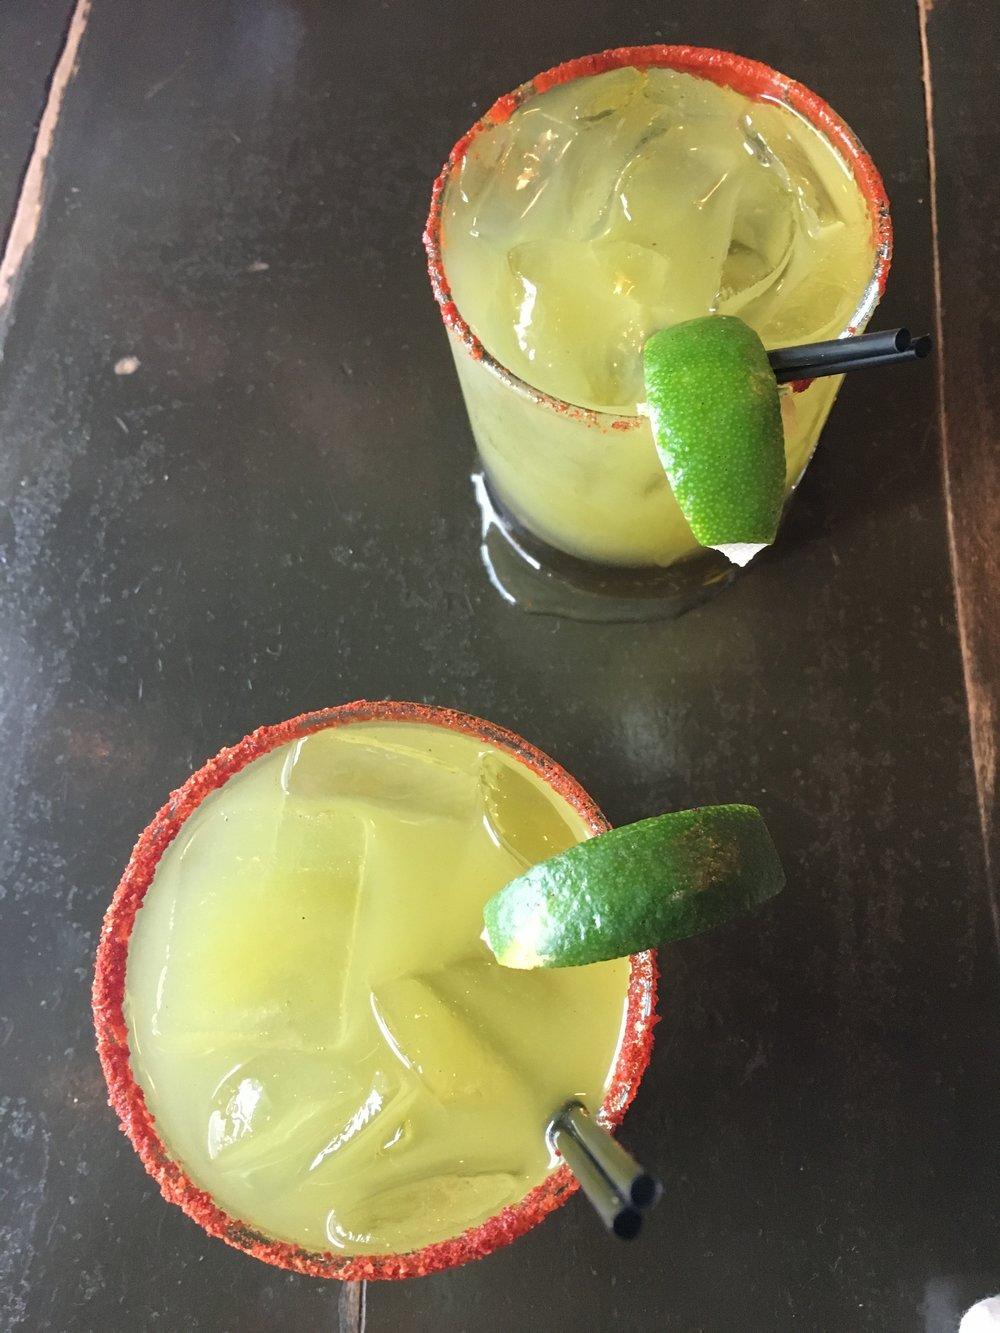 Jalapeño margaritas so delicious, they deserve their own full sized photo.